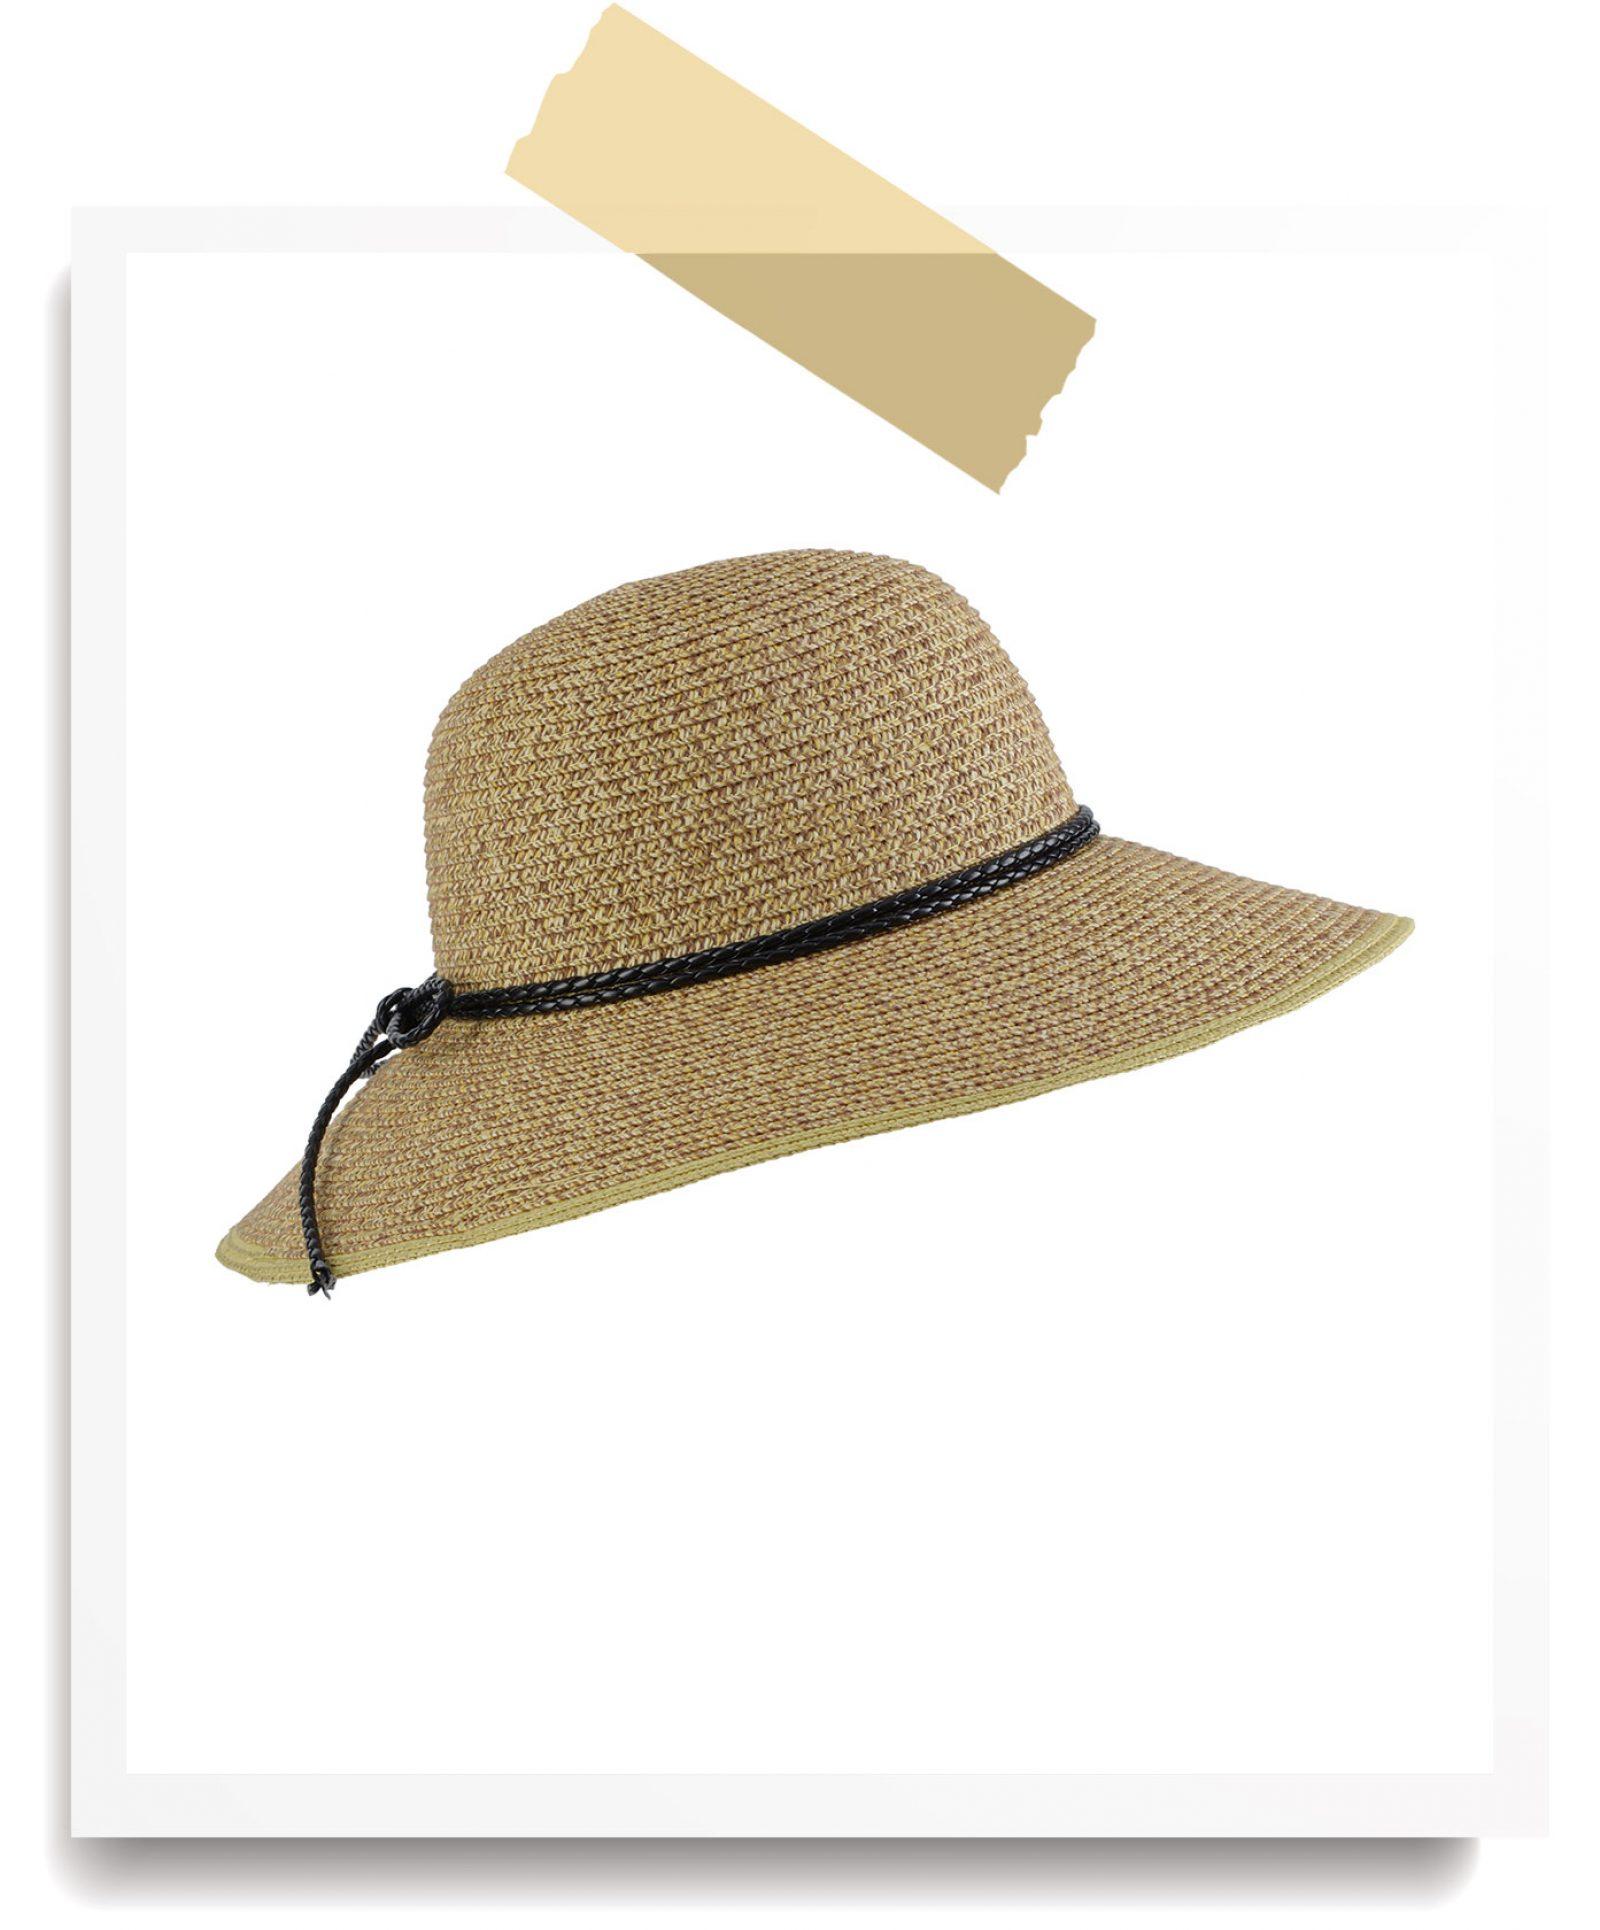 http://lookbook.allee-du-foulard.fr/wp-content/uploads/2018/06/0680-ADF-Accessoires-de-mode-LB-Soldes-Ete-capeline-beige-1600x1930.jpg